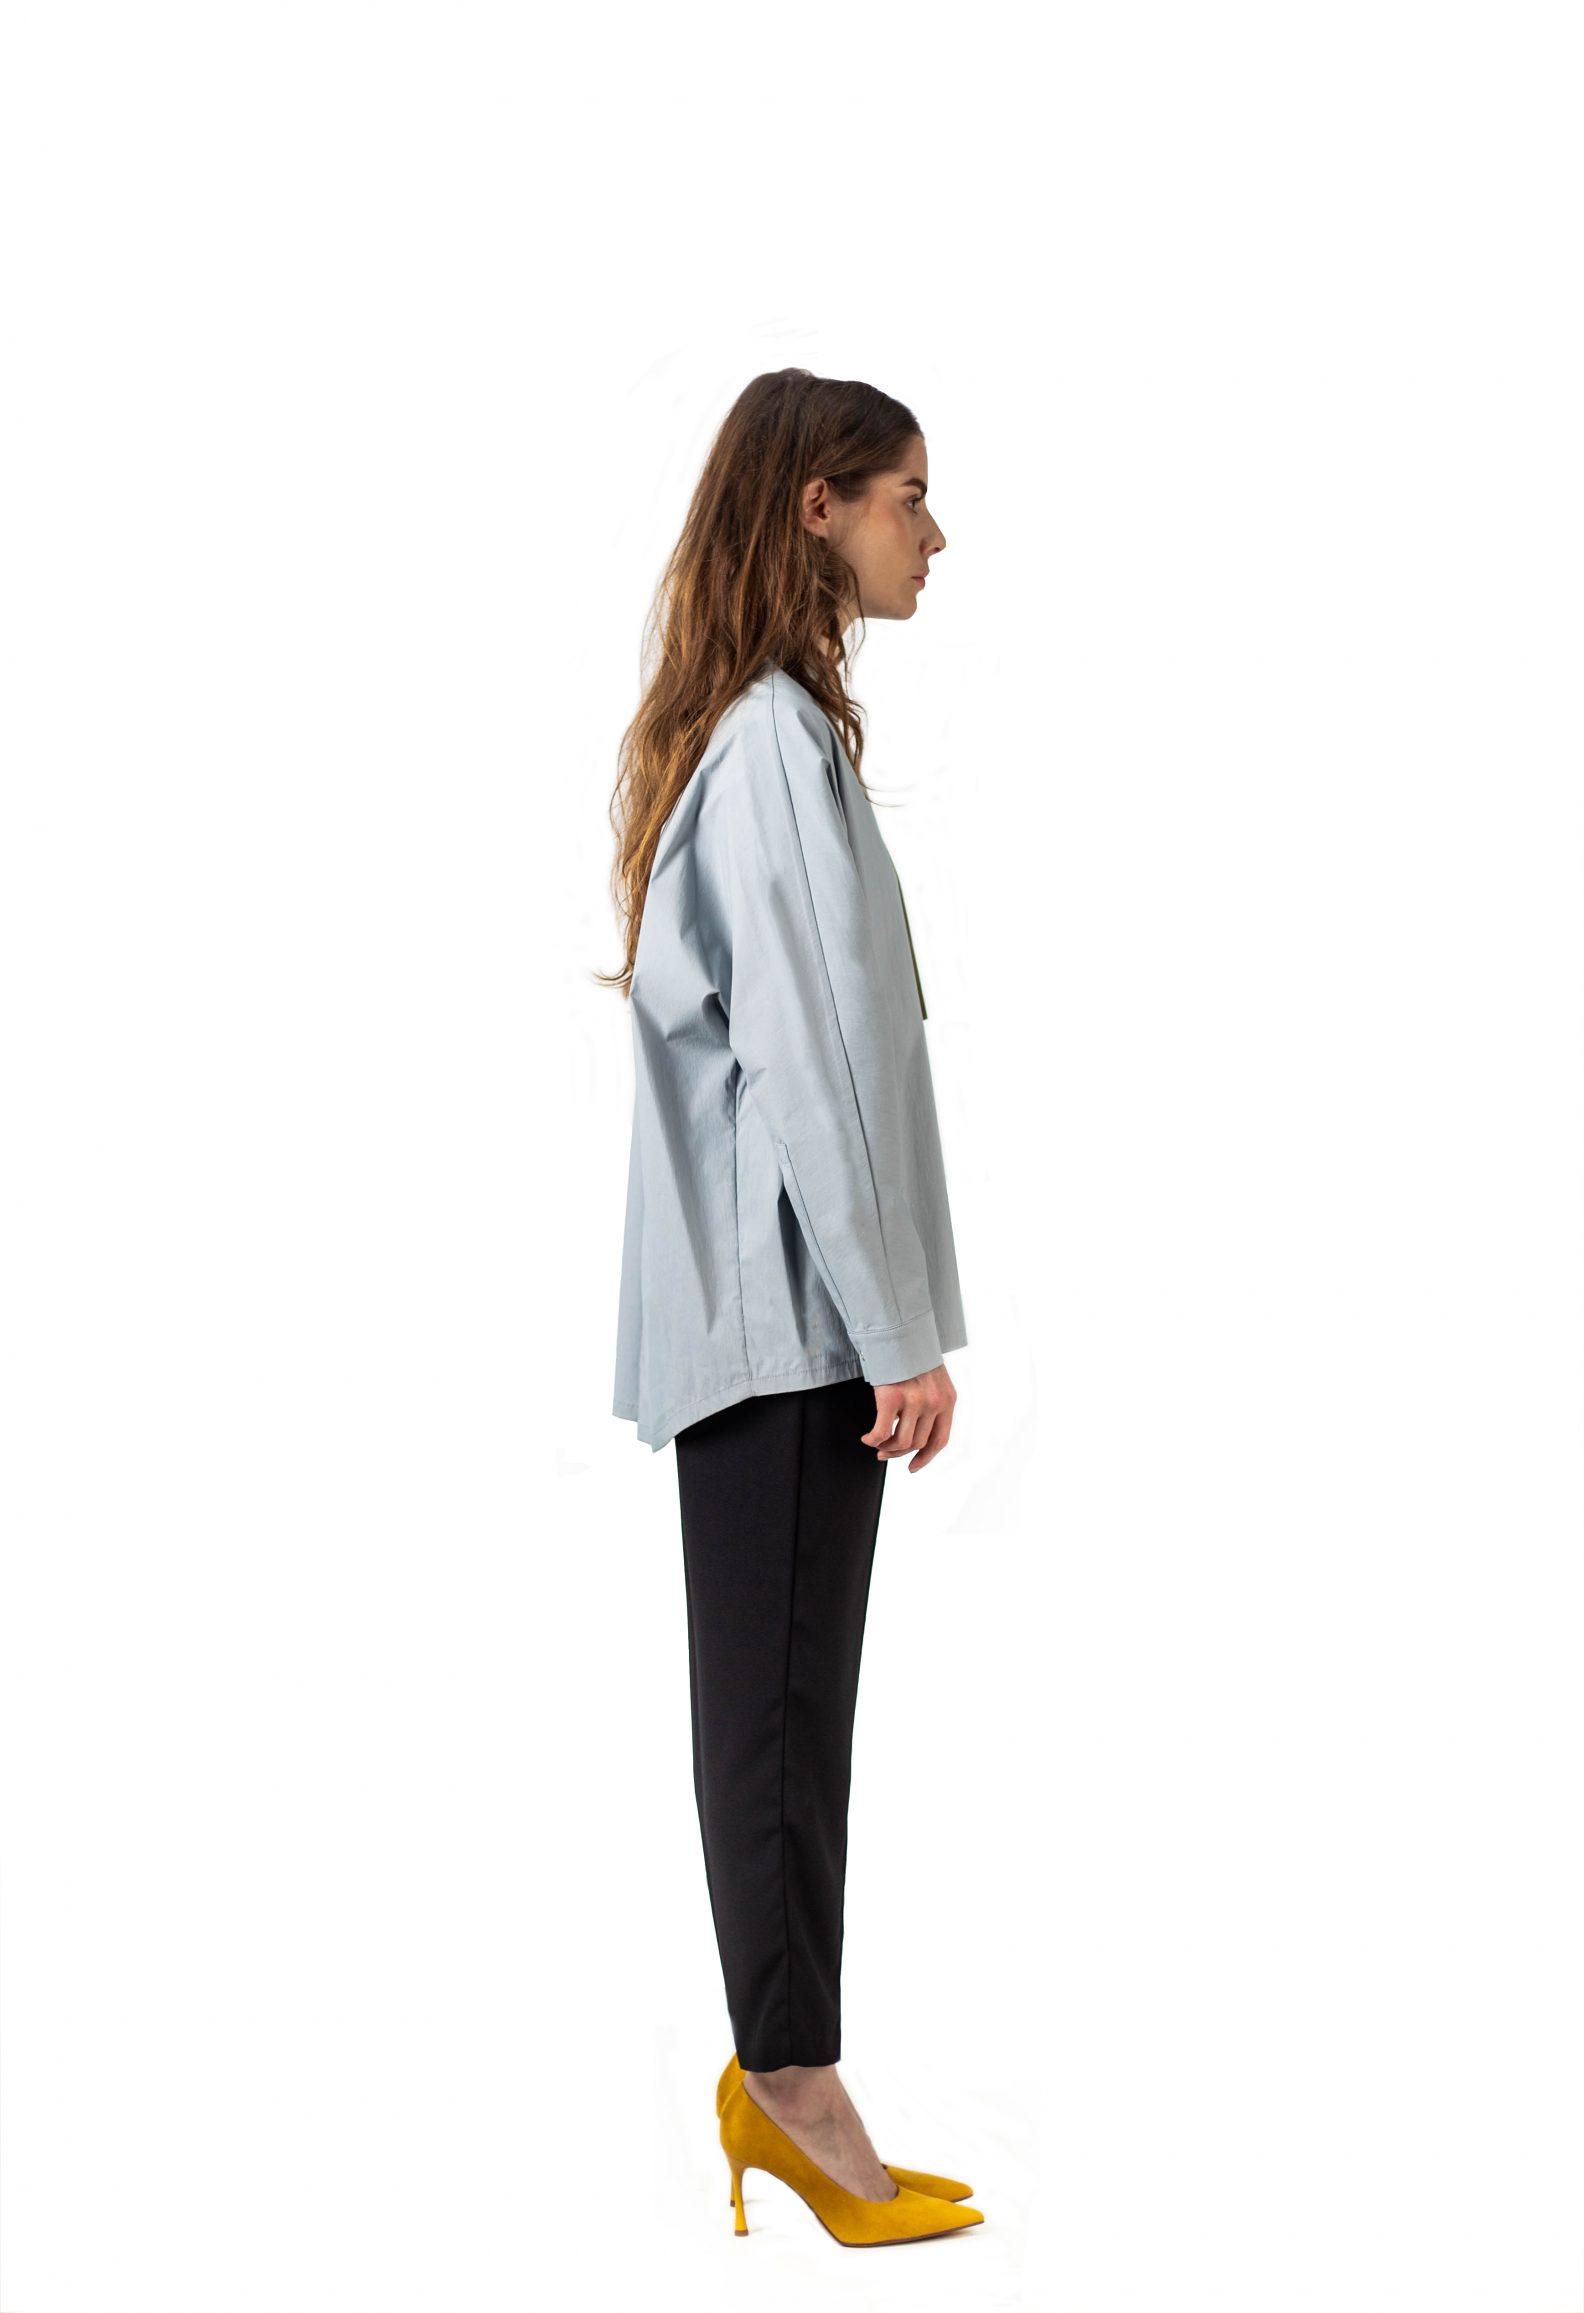 2-chemise-unisexe-affaires-etrangeres-paris-kpop-besides-kimchi